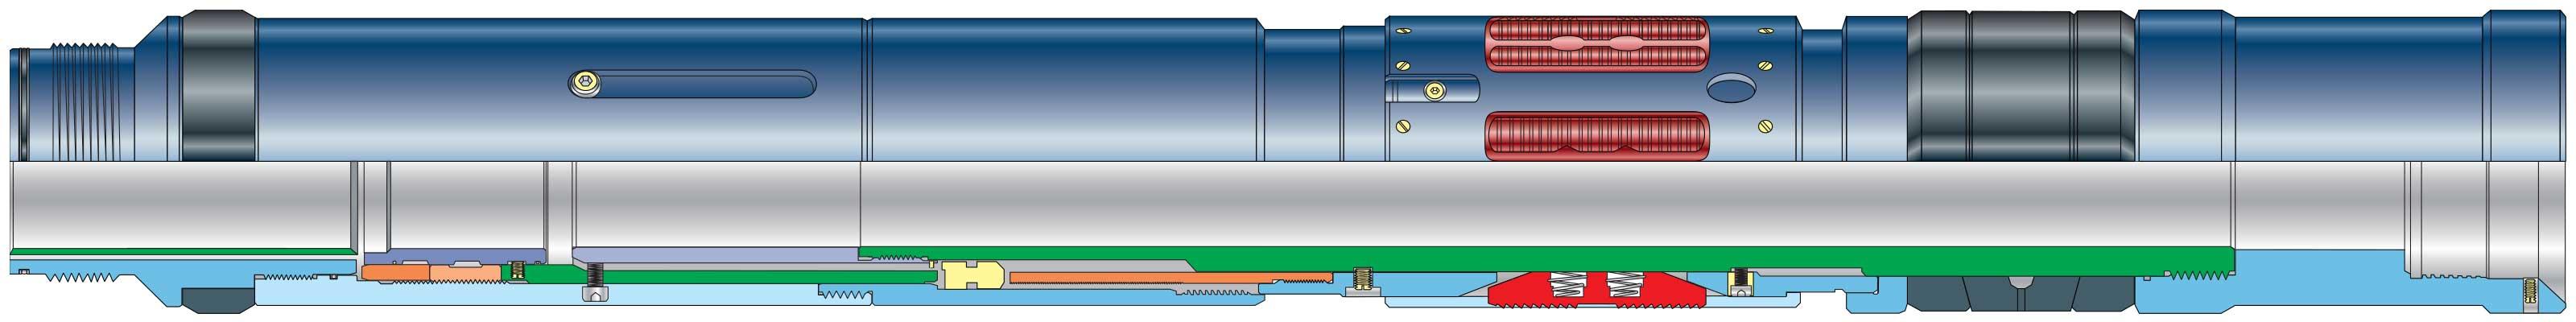 QUANTUM HSB Gravel-Pack Dual-Bore and Sealbore Packer